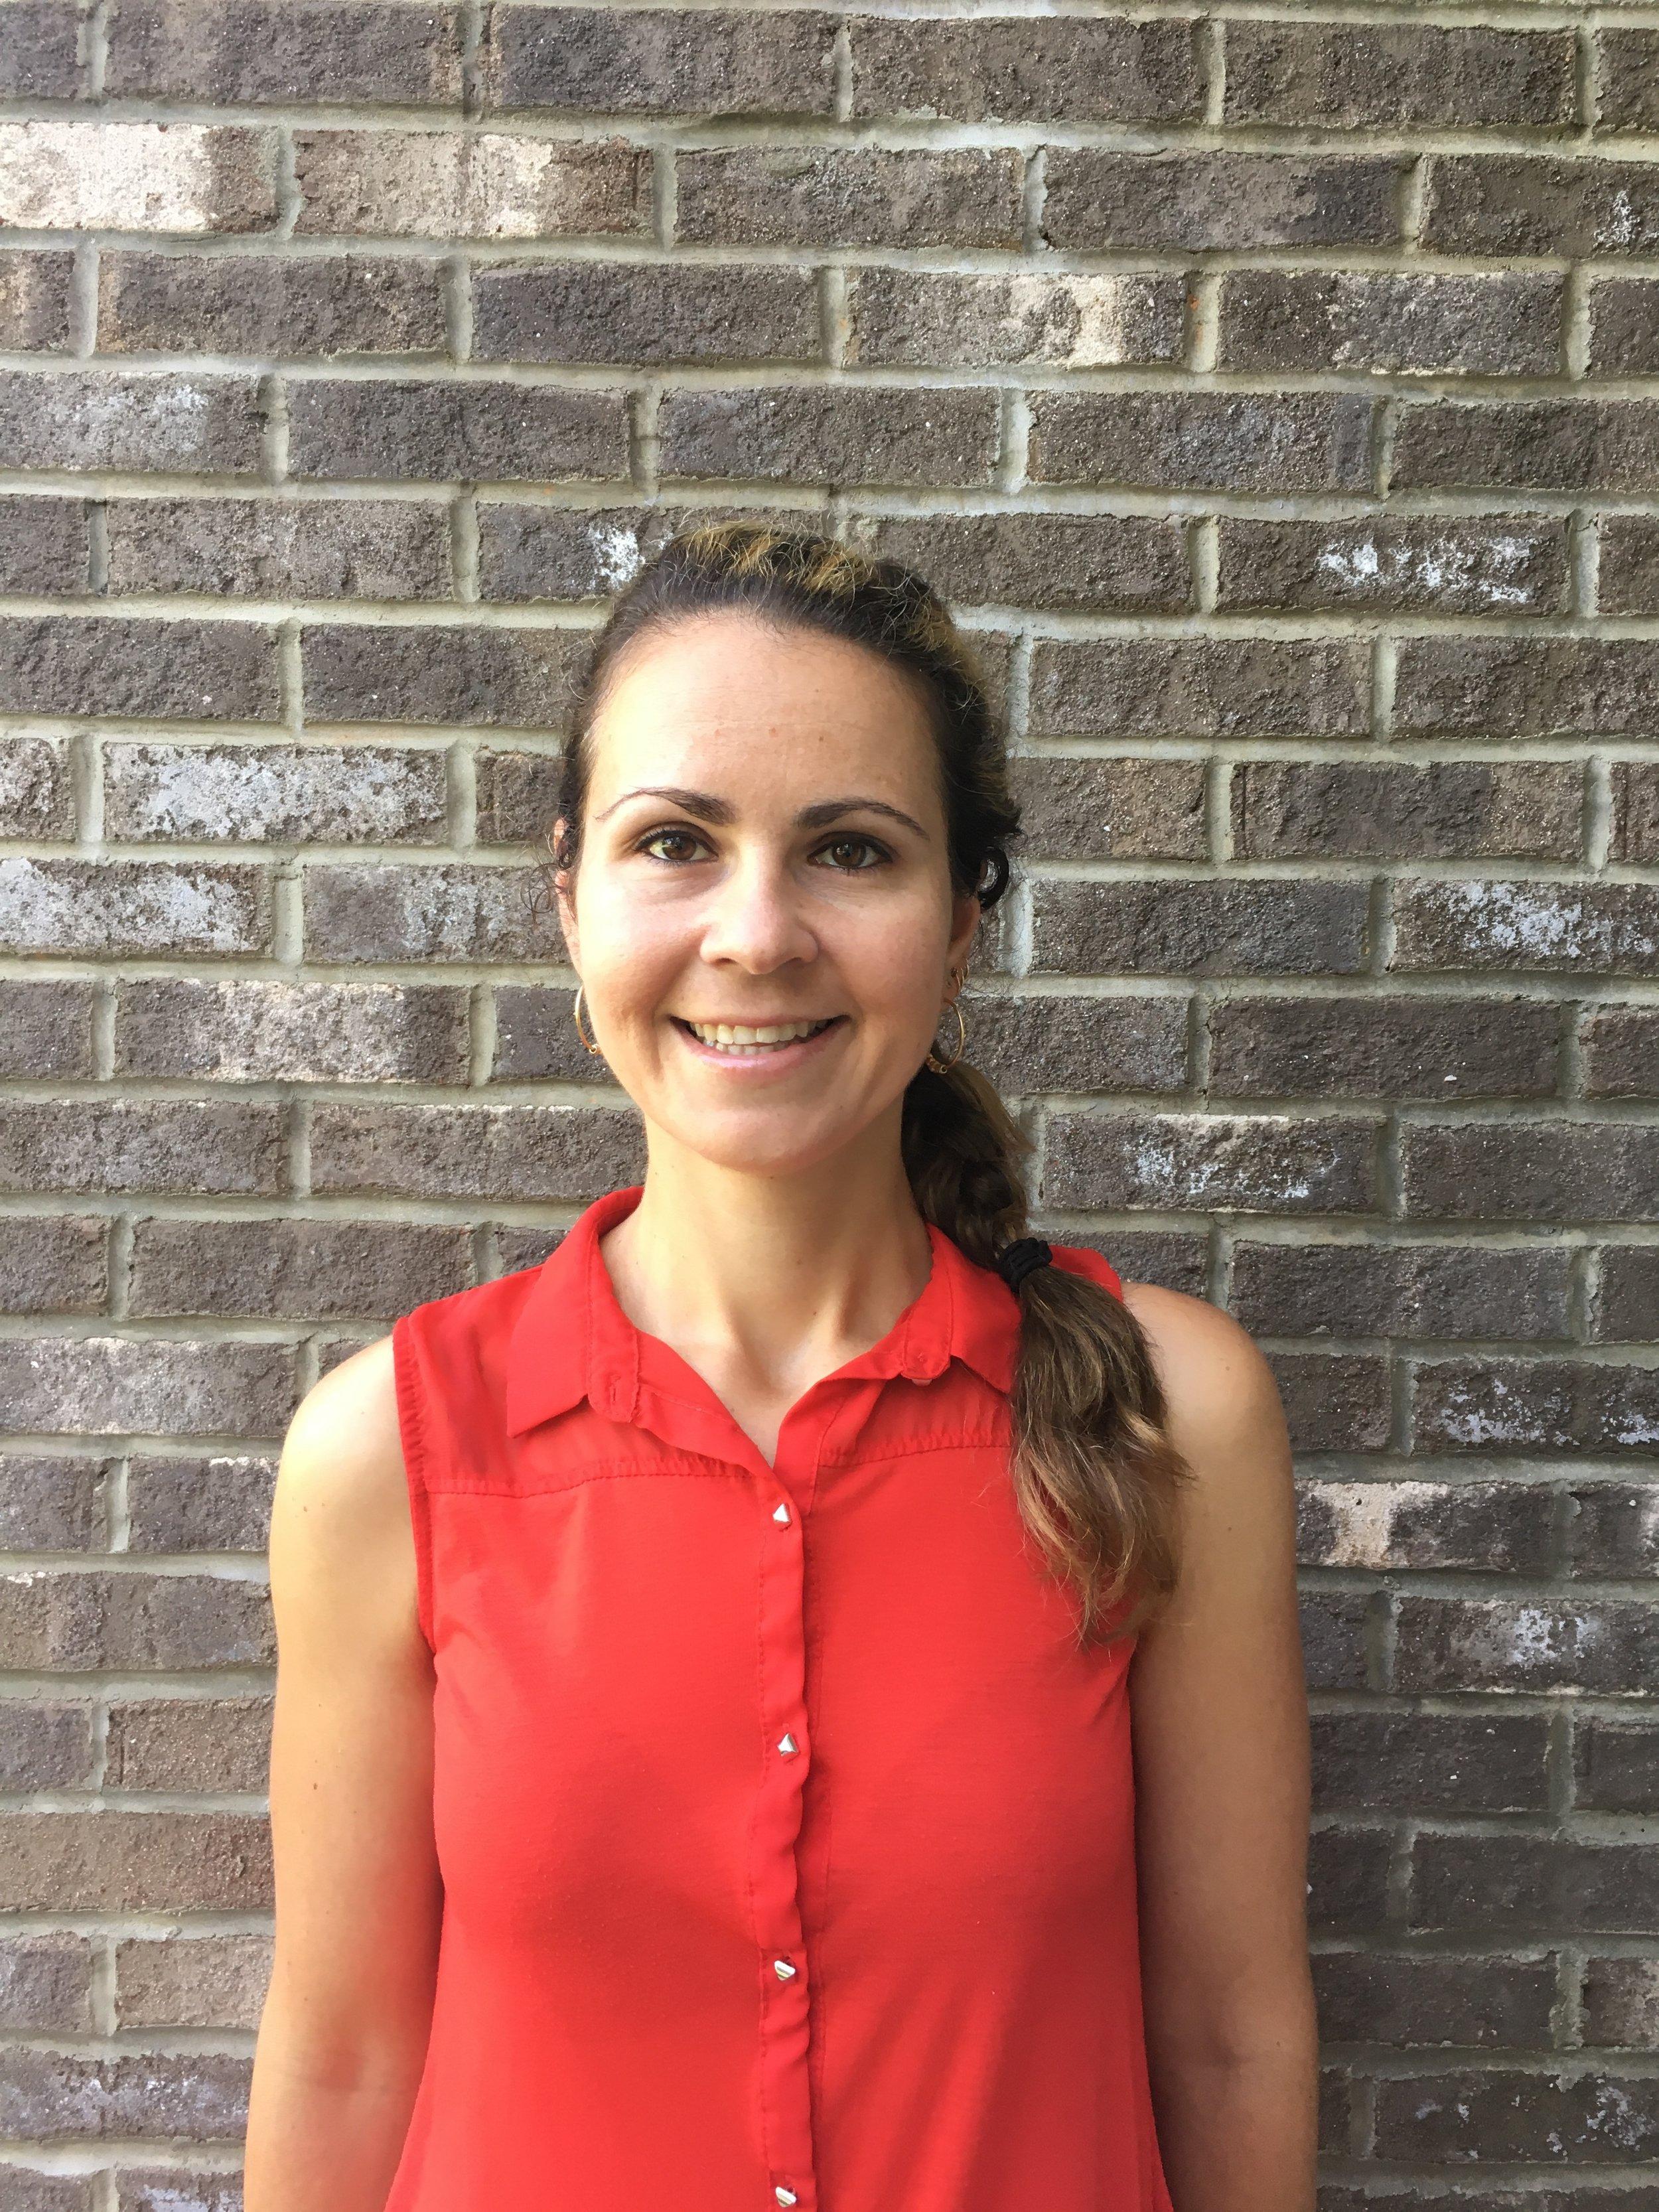 Nina Tsvetanova, Ph.D.    Principal Investigator   Assistant Professor of Pharmacology & Cancer Biology   nikoleta.tsvetanova@duke.edu